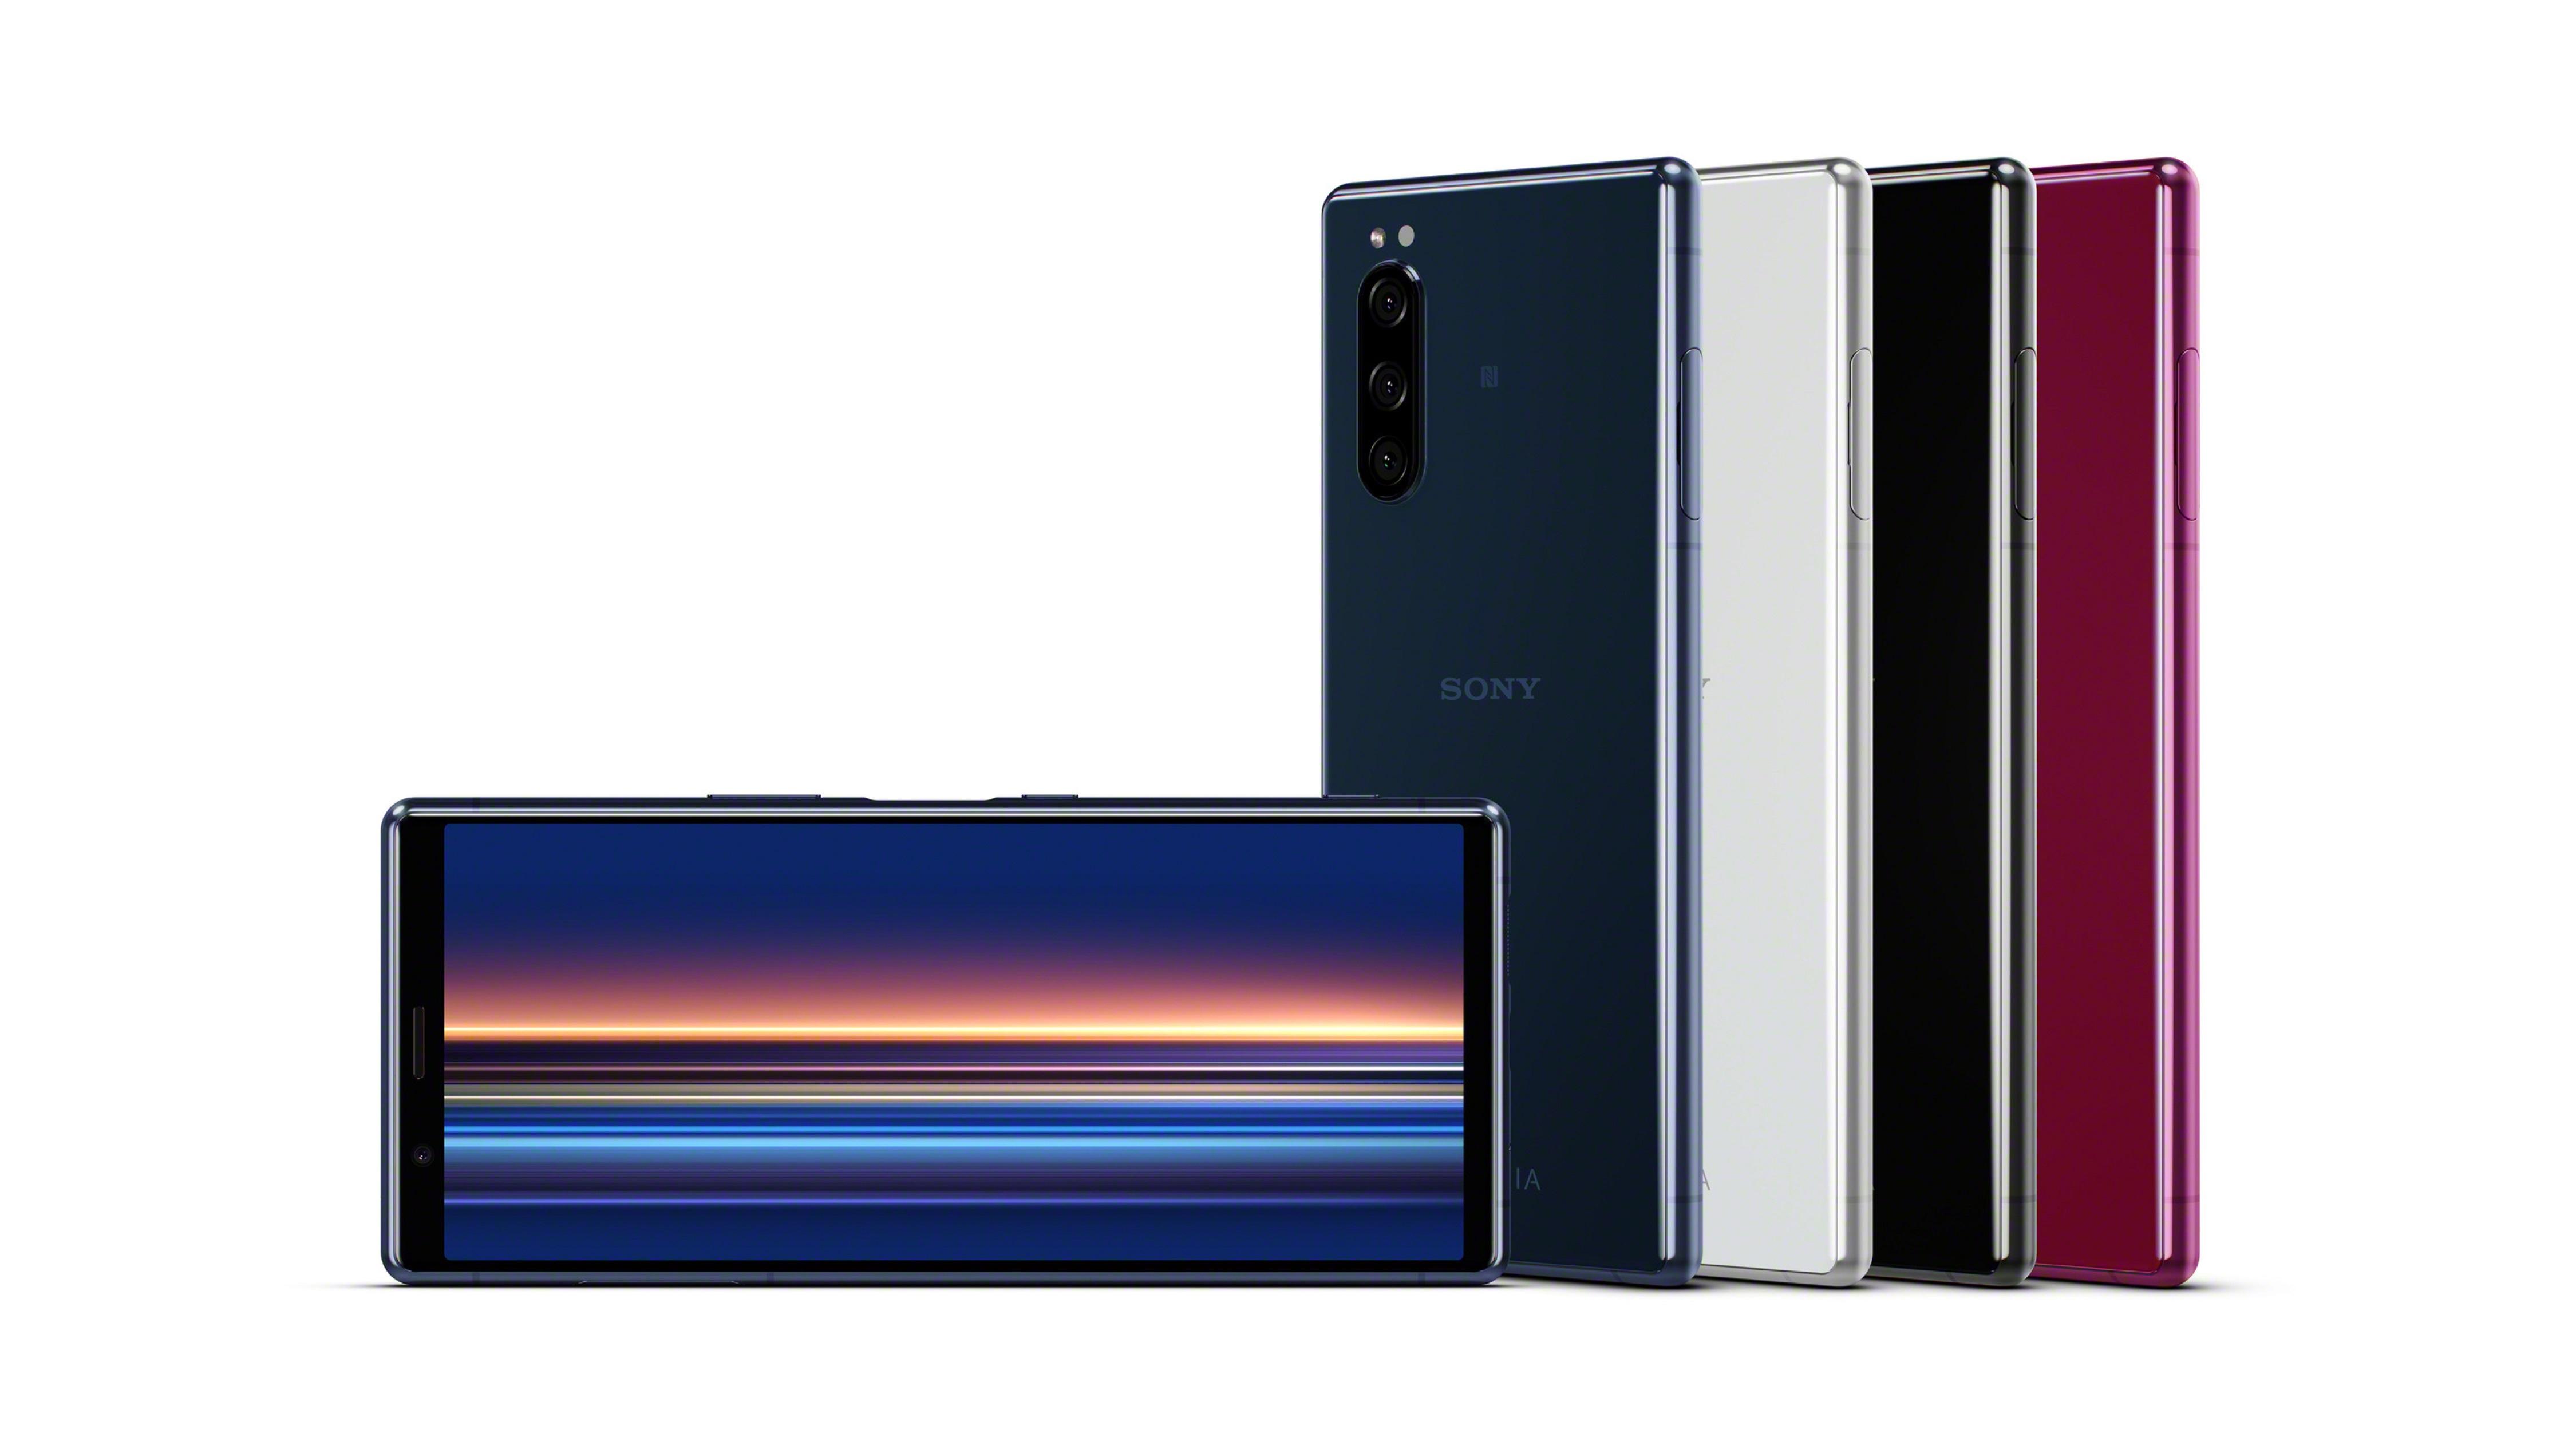 Sony Mobile今0905於2019年IFA發表全新旗艦手機Xperia 5,輕薄美型,創意娛樂體驗,輕鬆一手掌握